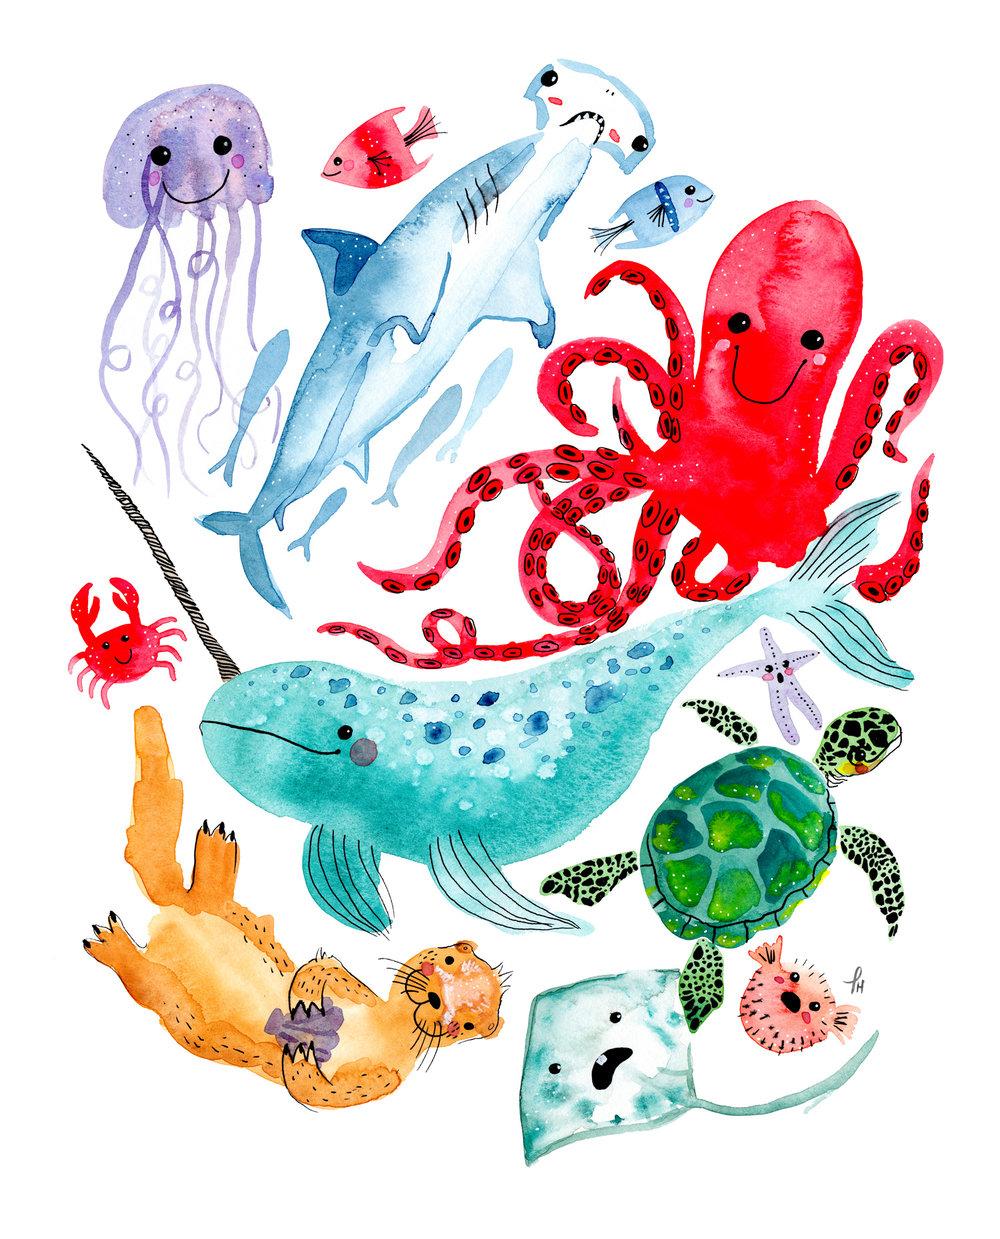 PatriceHorvath_OceanCreatures_web.jpg